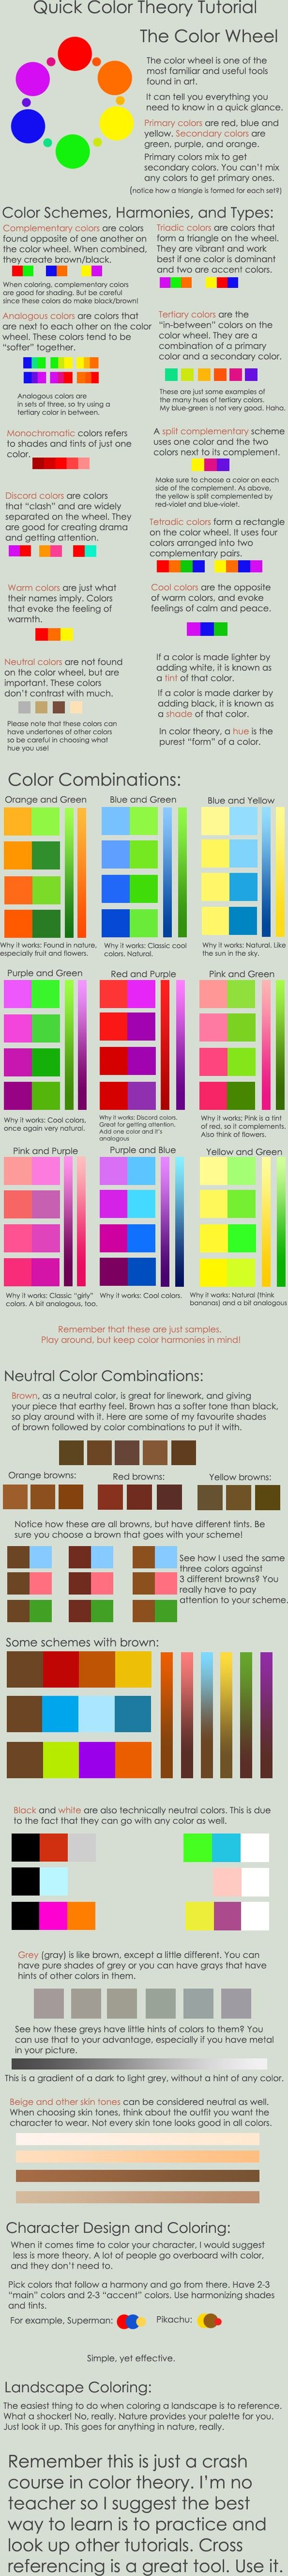 aa23392b5c3b5e8a478010cff8f15d84--painting-tutorials-art-tutorials Fabelhafte Psychologische Wirkung Von Farben Dekorationen